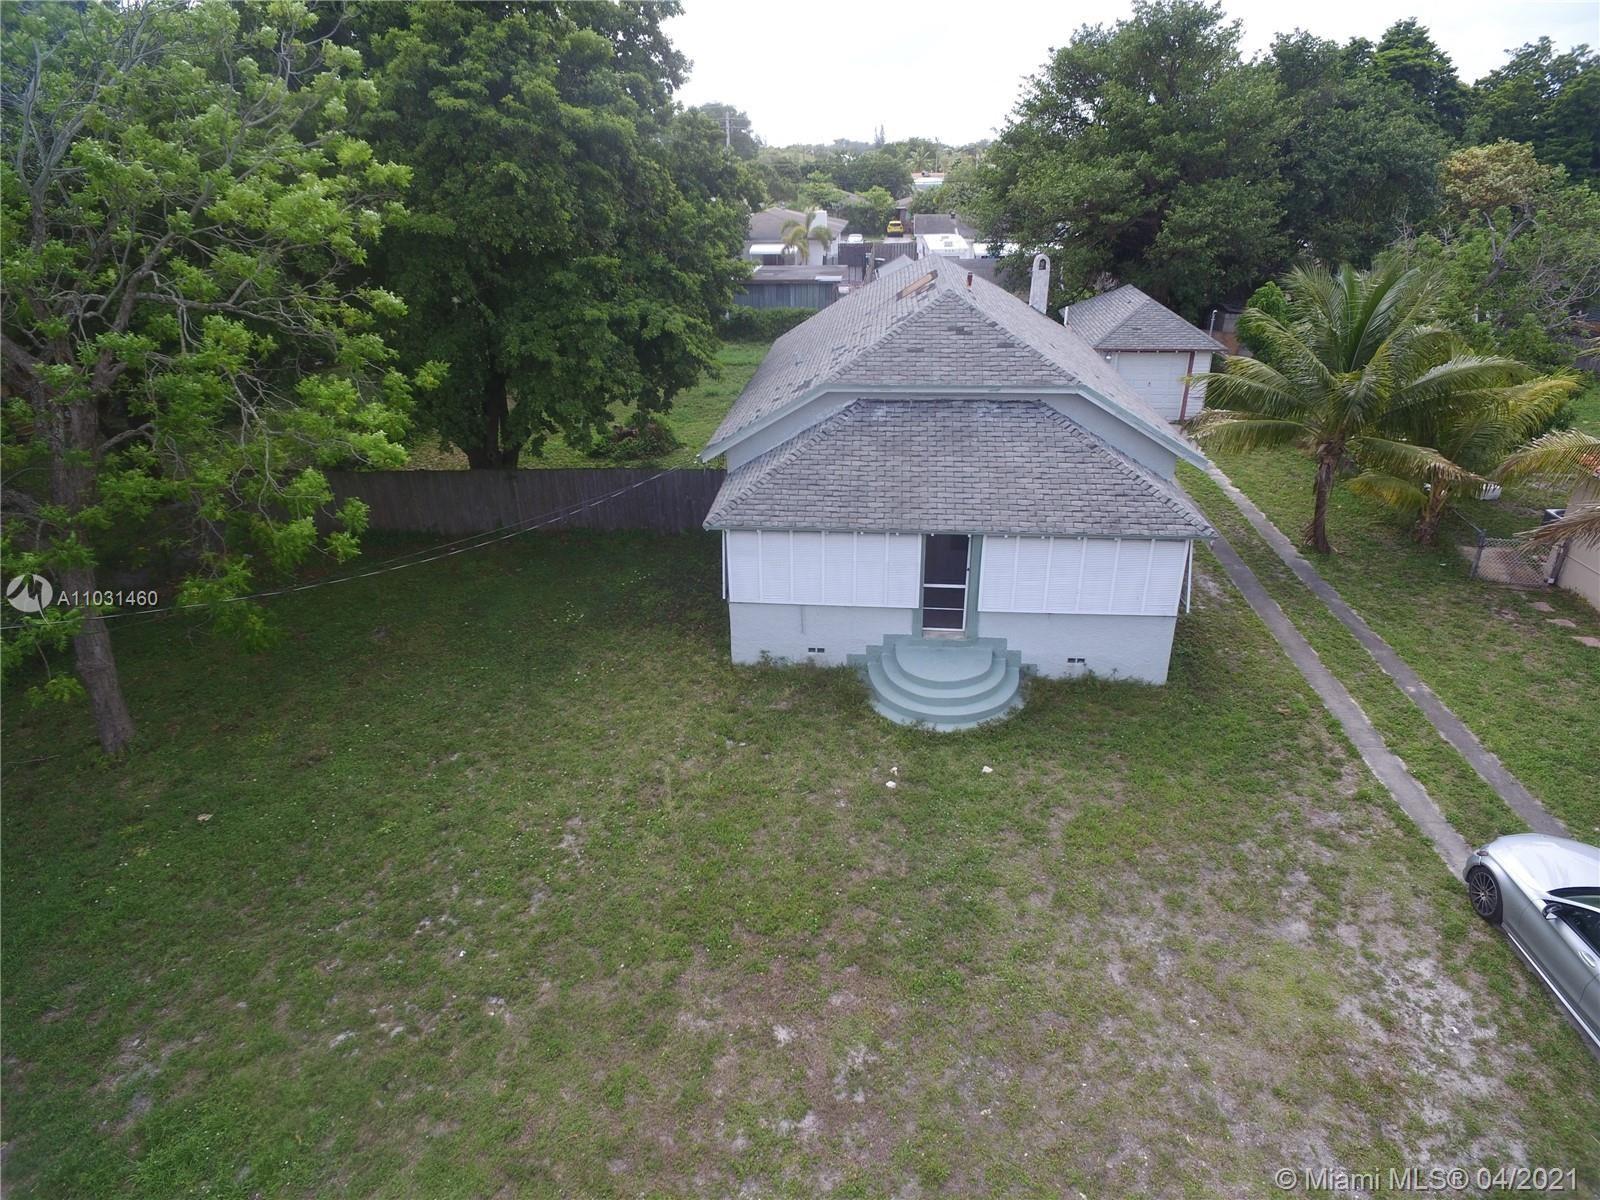 Photo of 120 SW 1st Ave, Hallandale Beach, FL 33009 (MLS # A11031460)